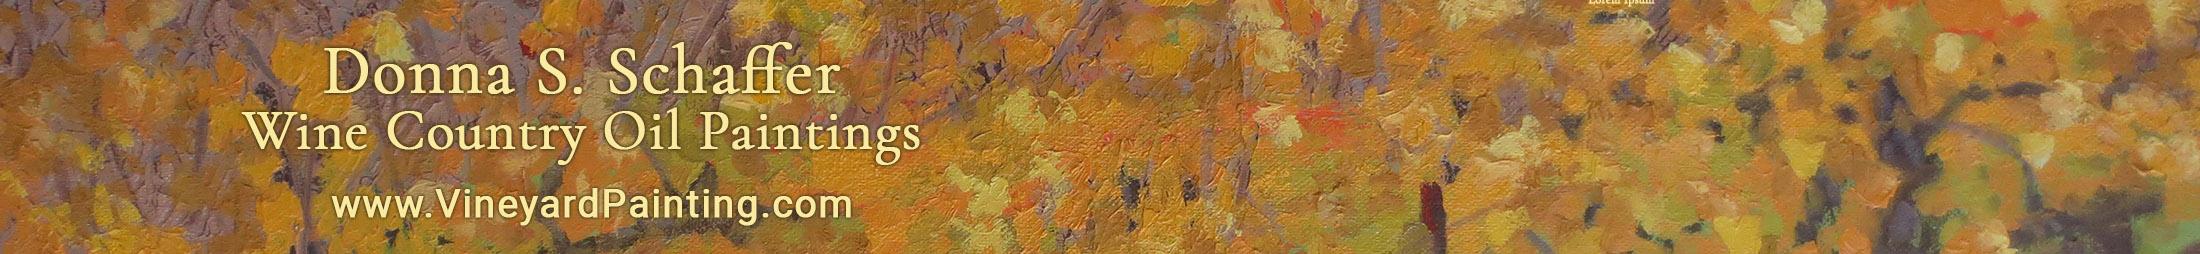 Donna Schaffer Original Vineyards Oil Paintings Logo